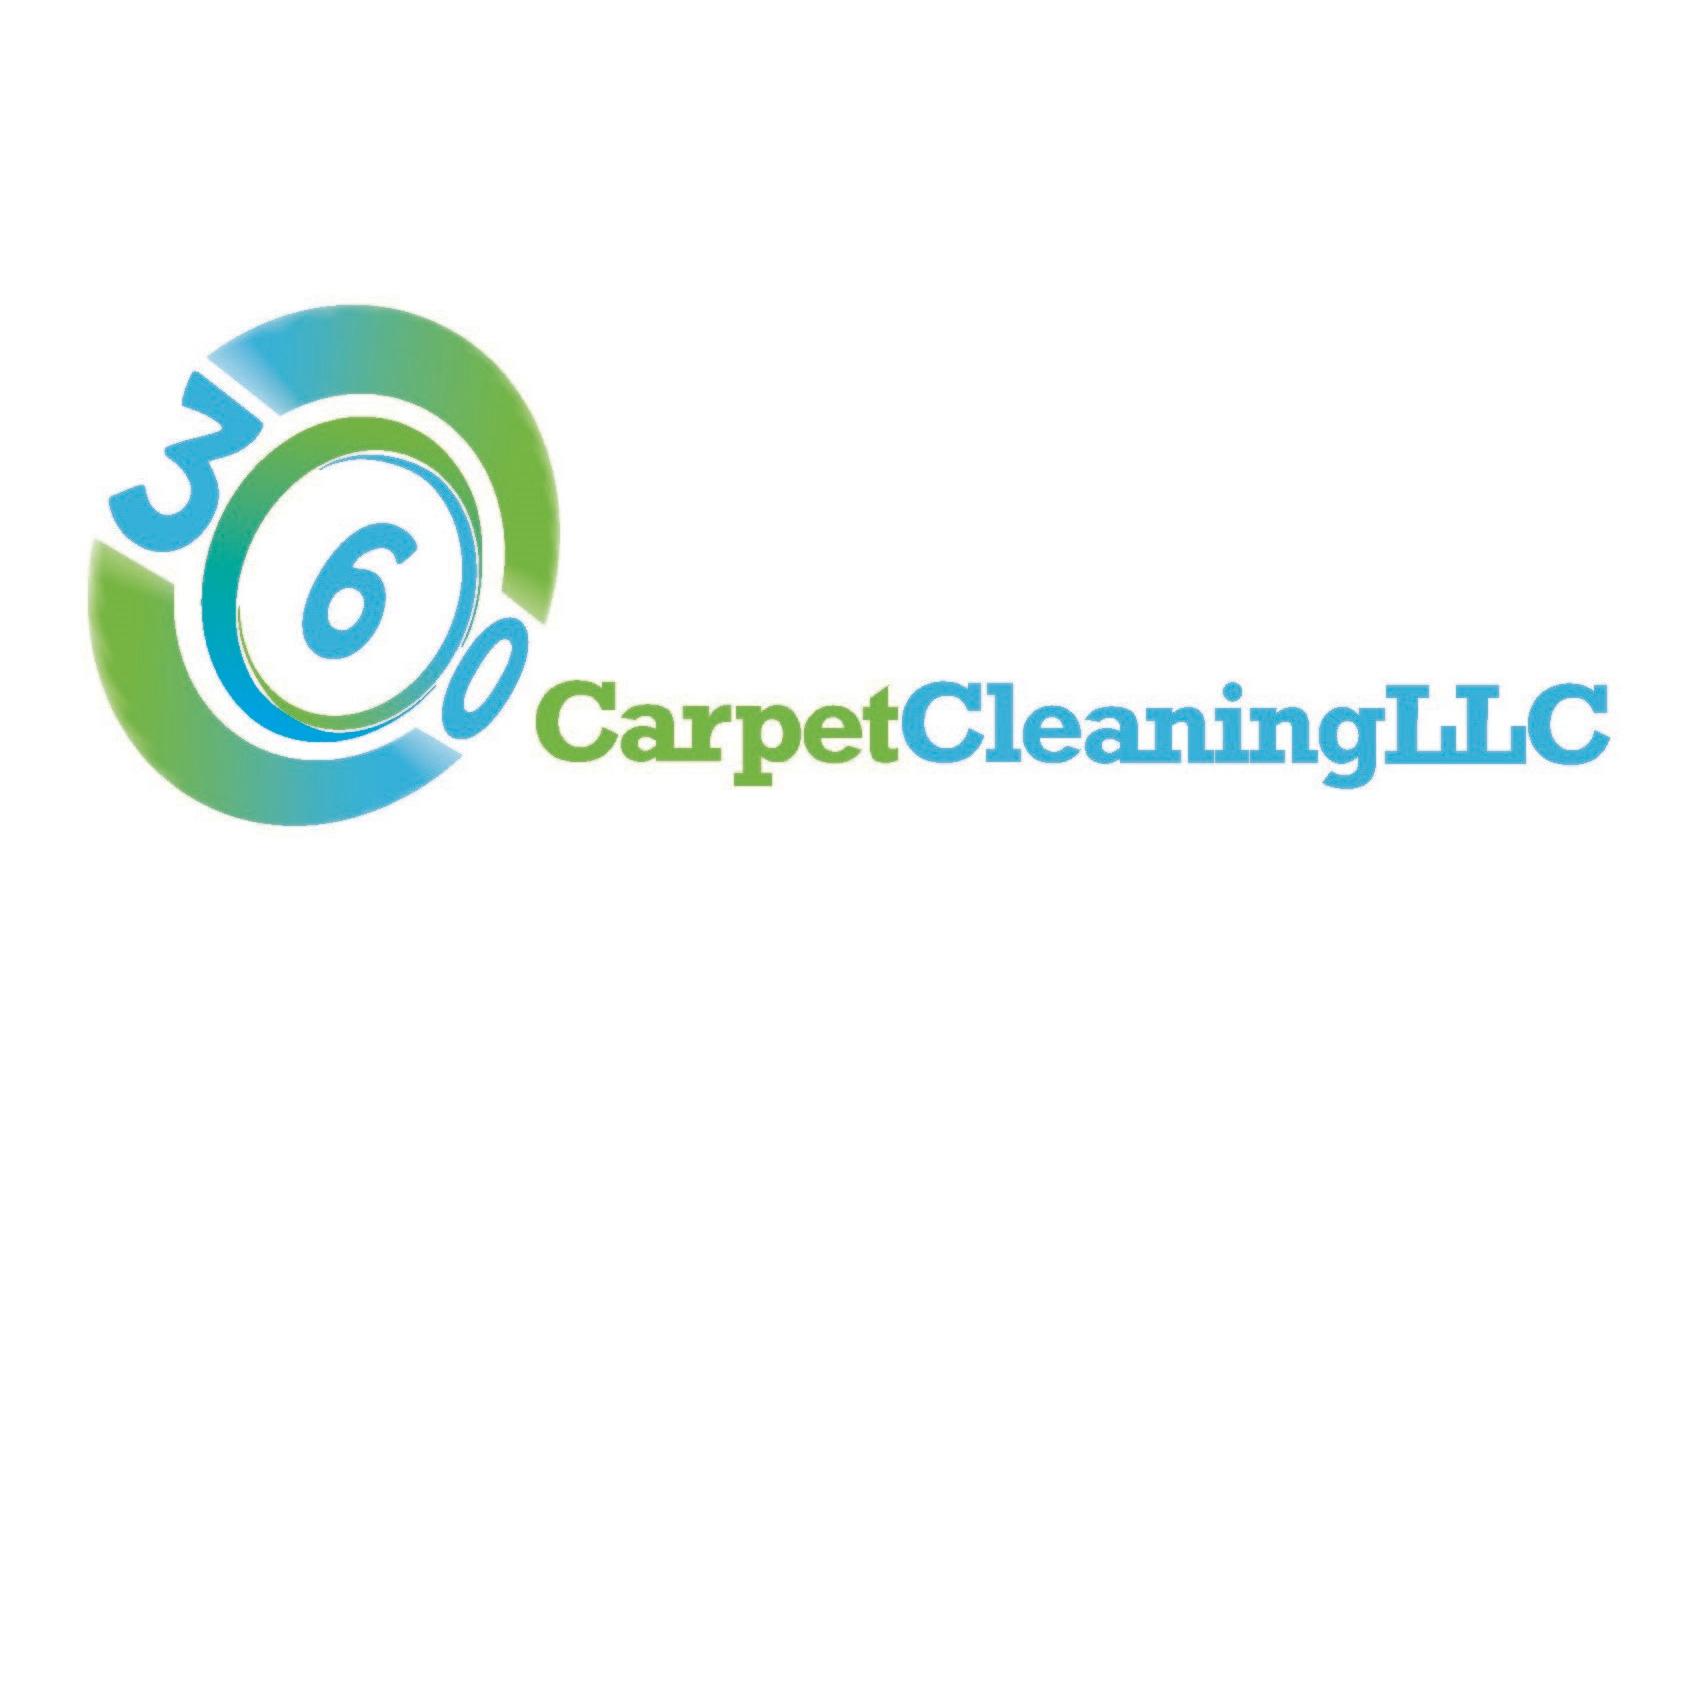 360 Carpet Cleaning LLC